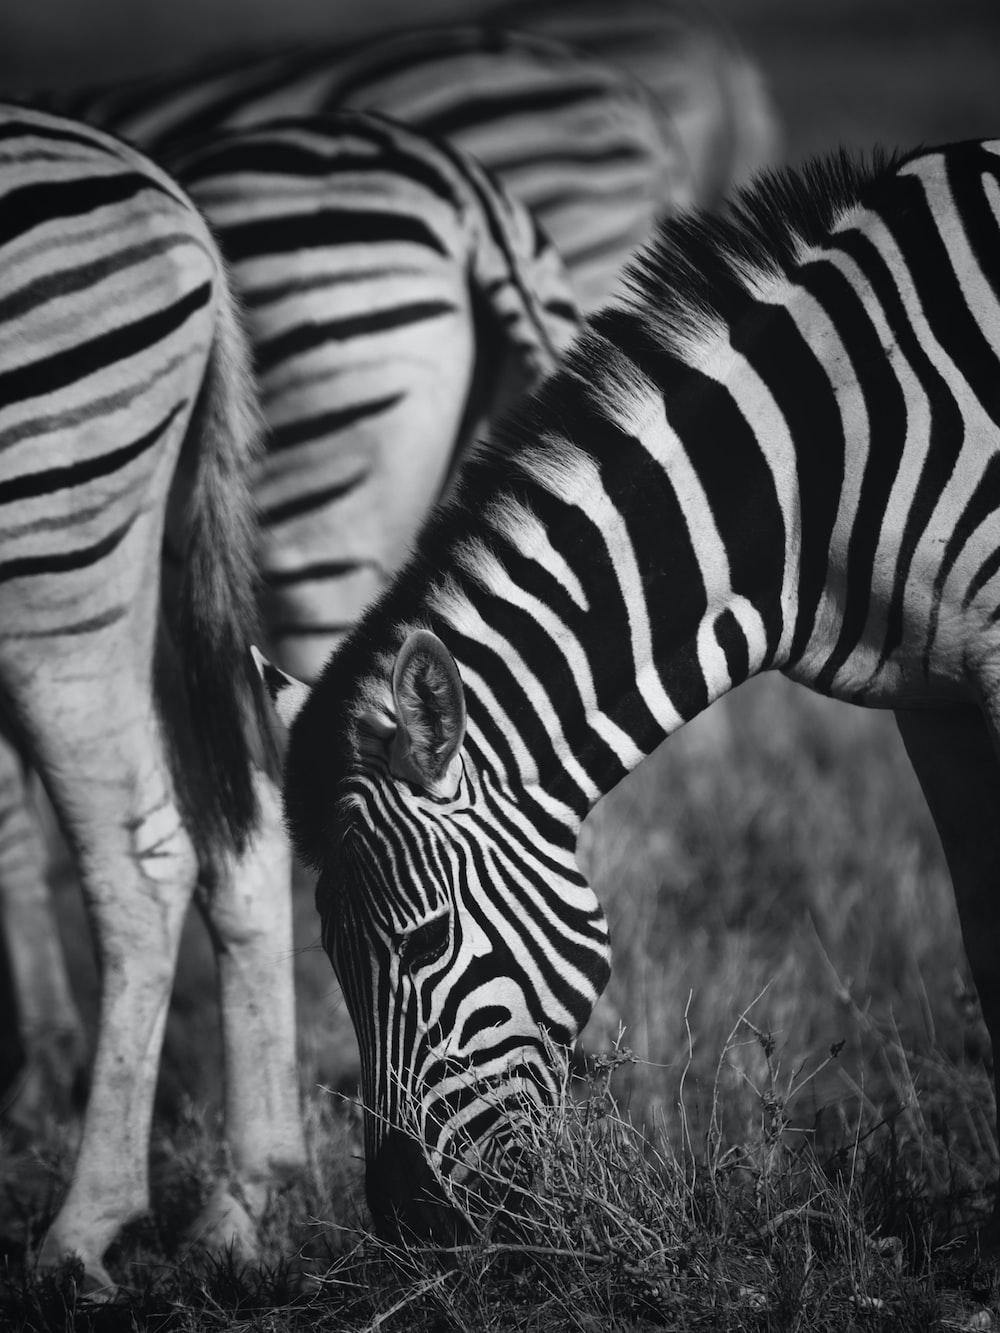 zebra standing on brown grass field